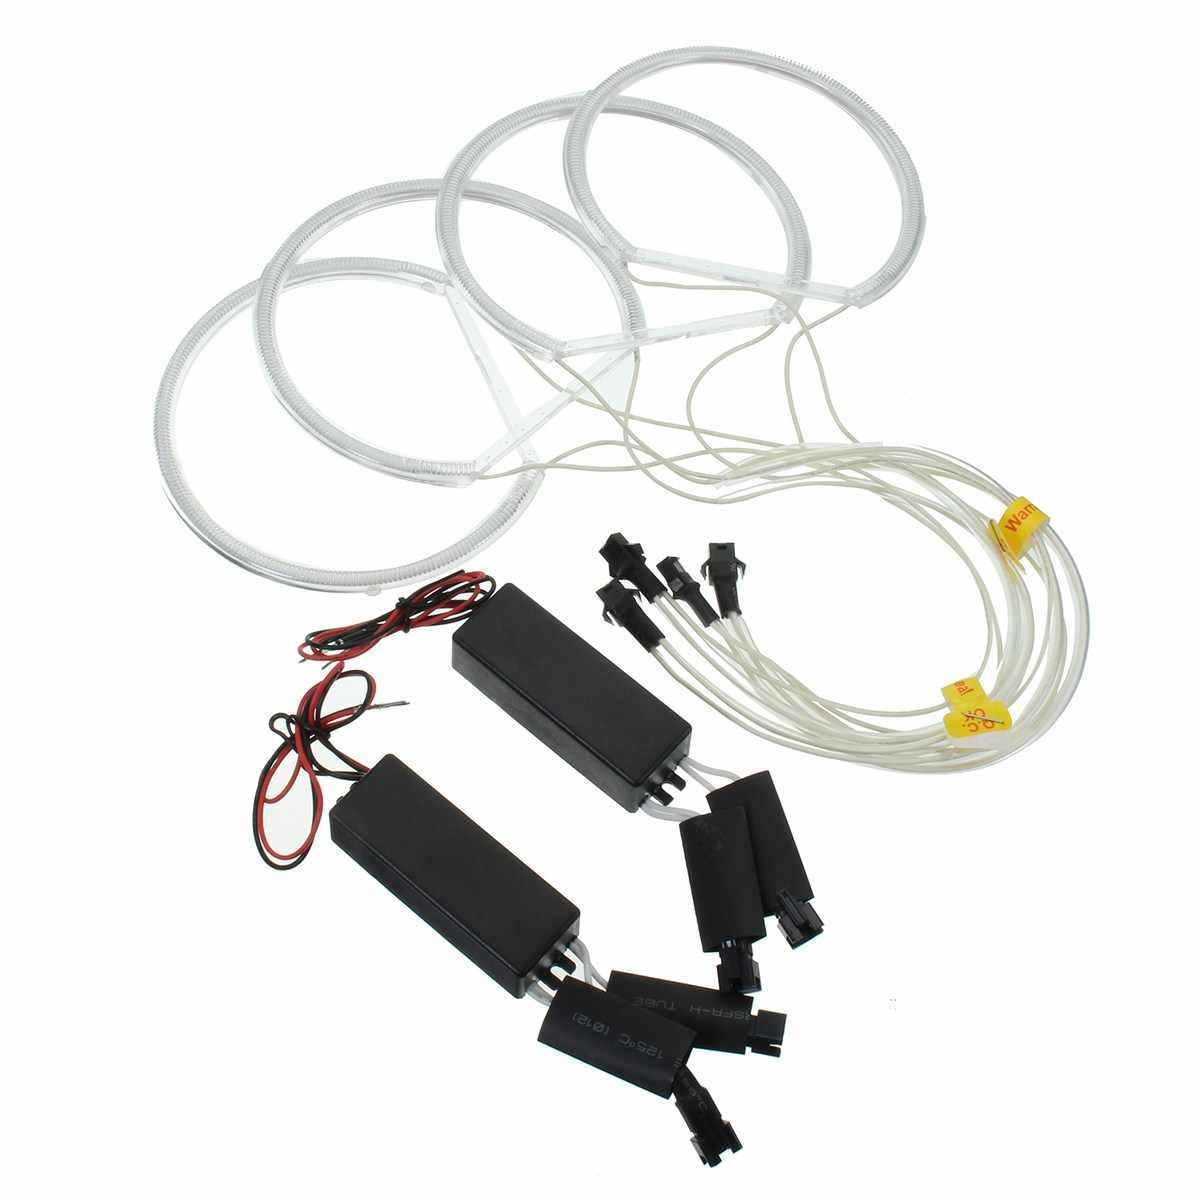 131mm Car Headlight CCFL Angel Eyes Kit Cool White Halo Ring   Error Free For BMW E36 E38 E39 E46